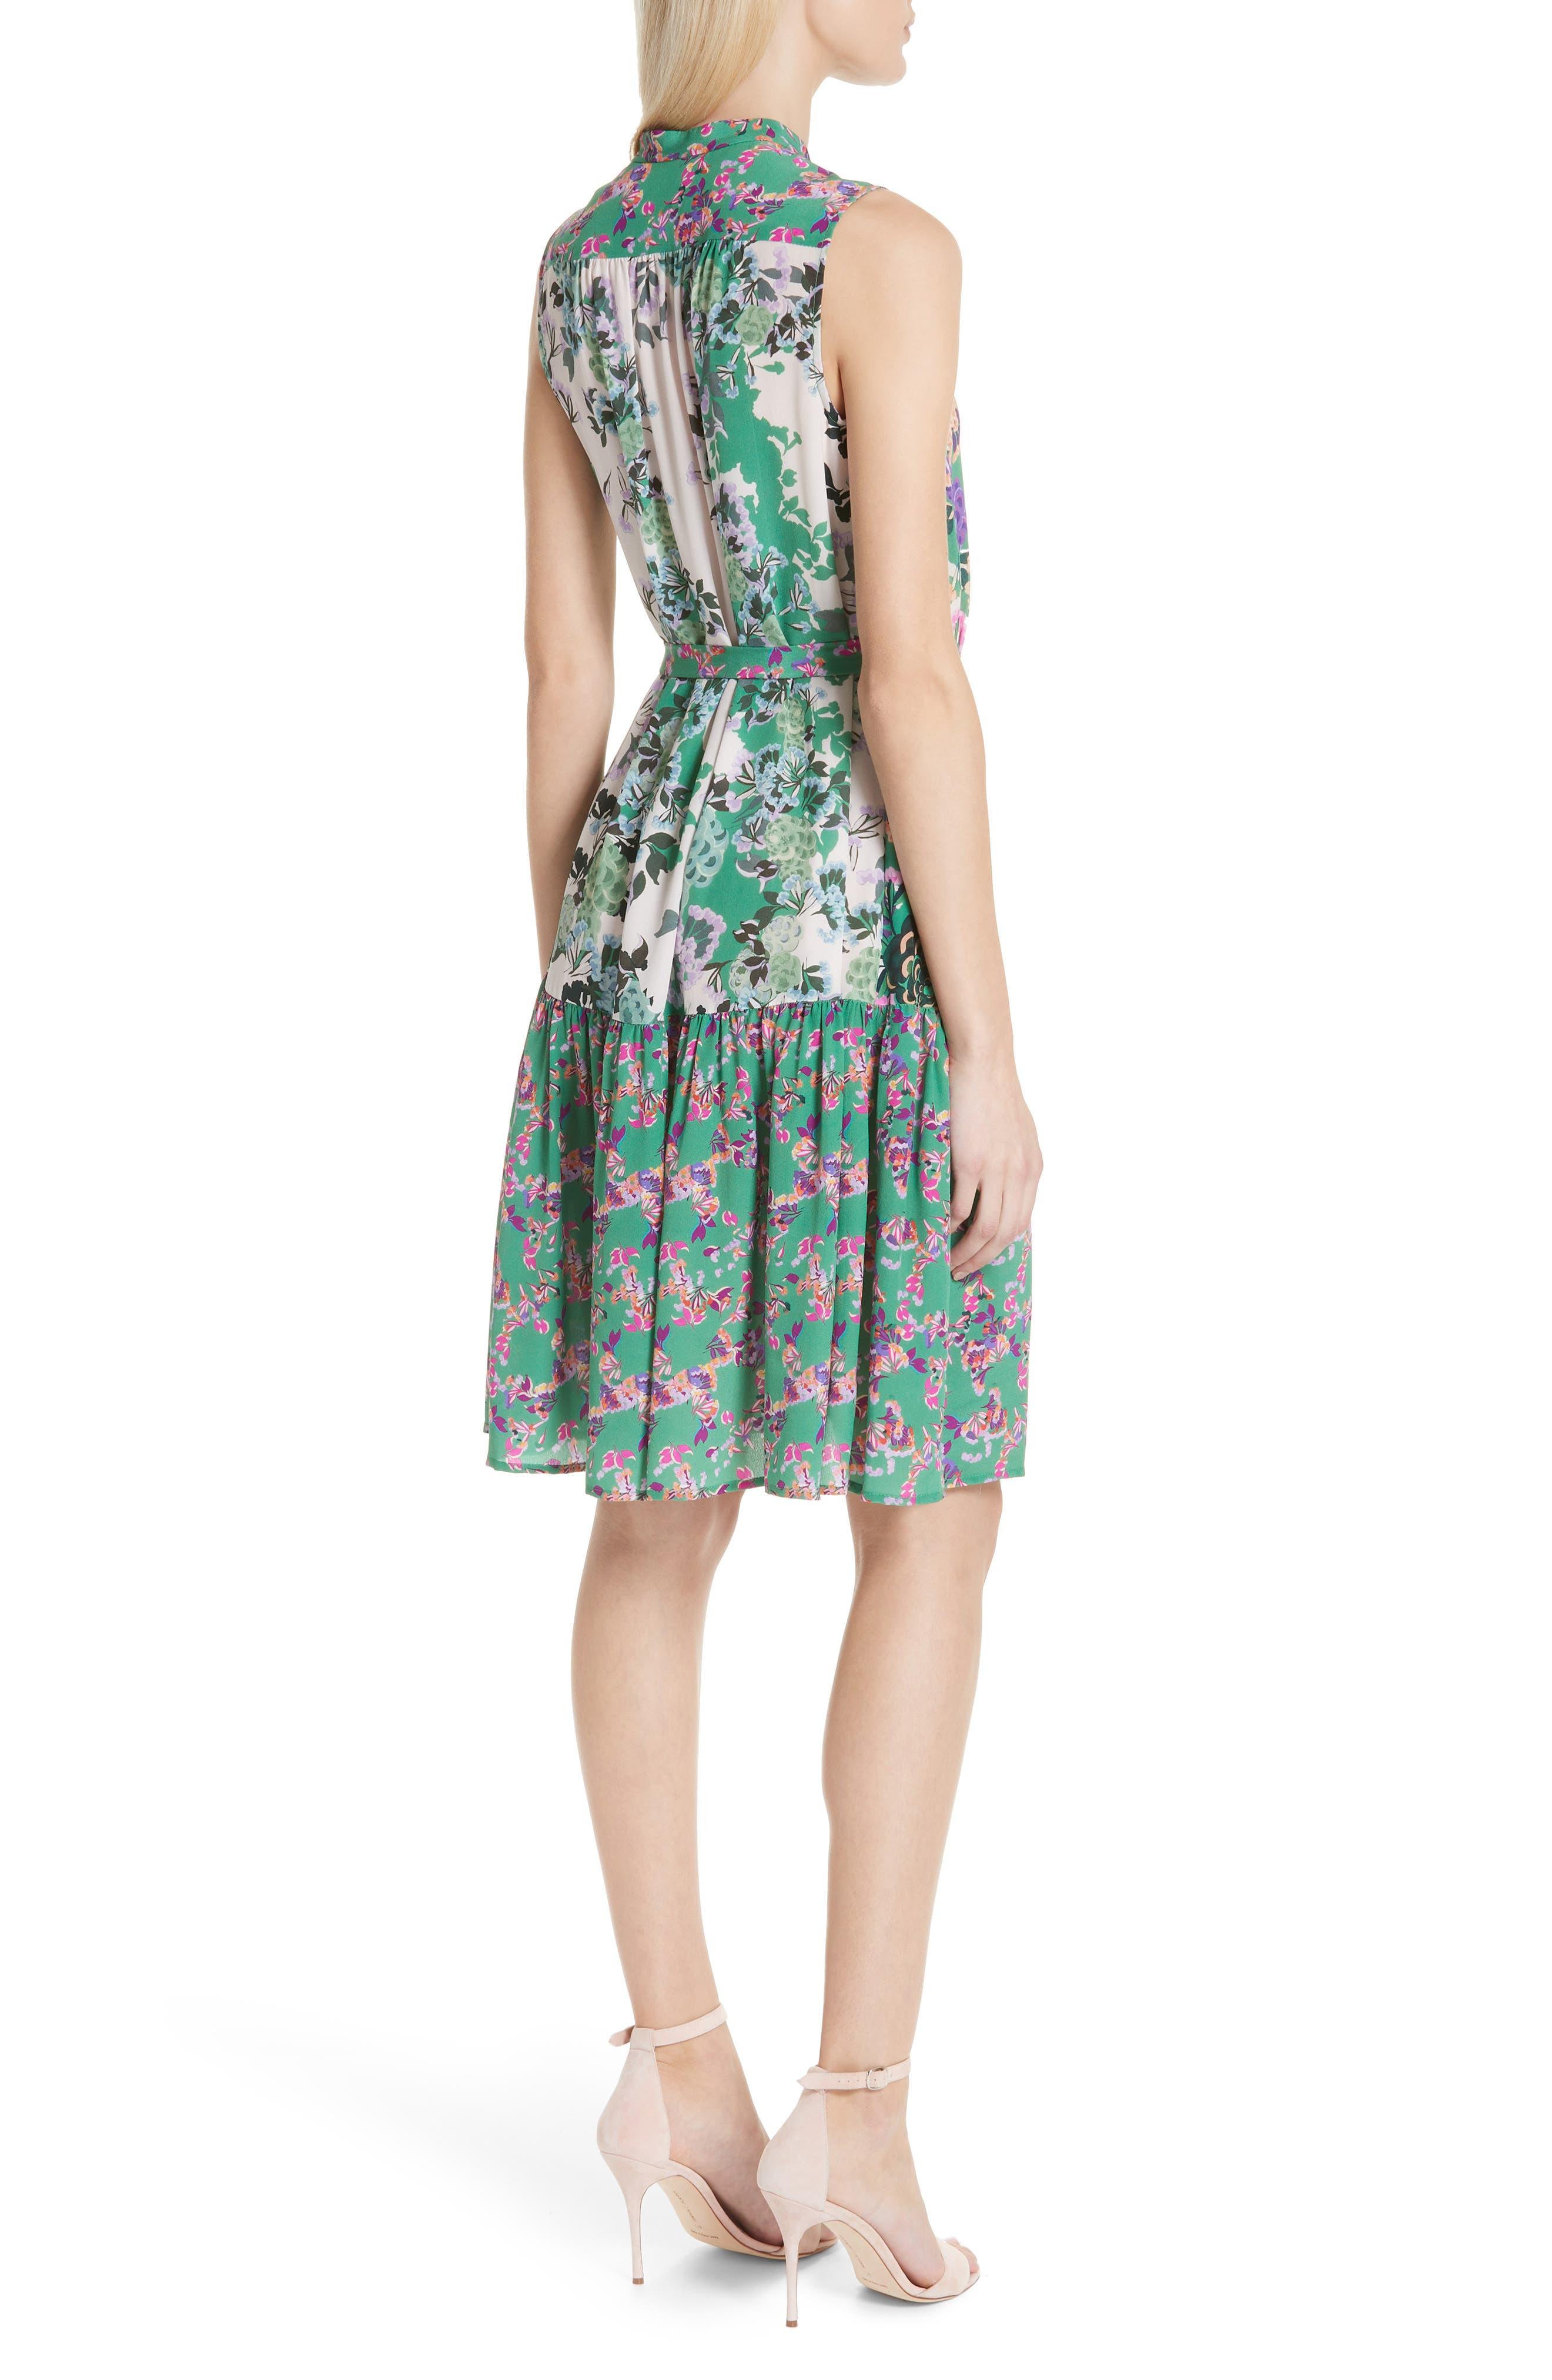 SALONI, Tilly Print Silk Dress, Alternate thumbnail 2, color, ROSE MEADOW PLMT